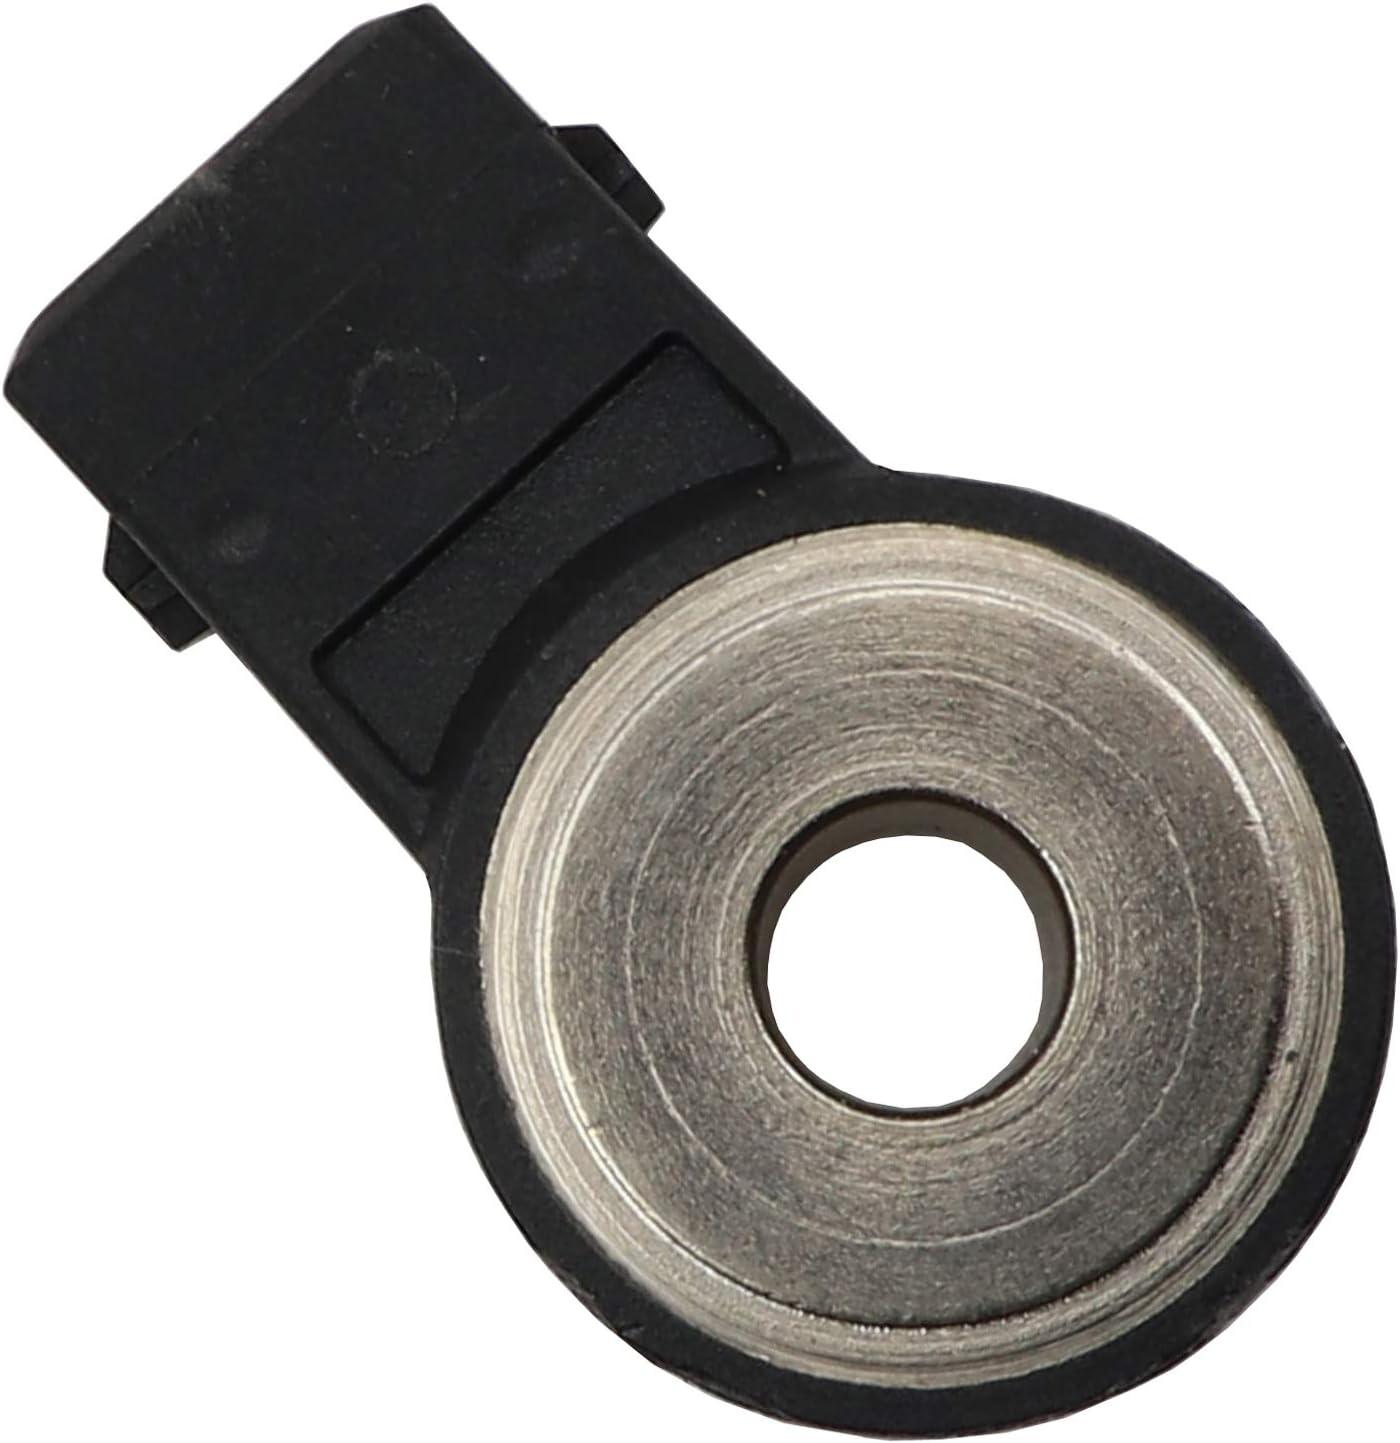 Beck Arnley 158-0873 Knock Sensor